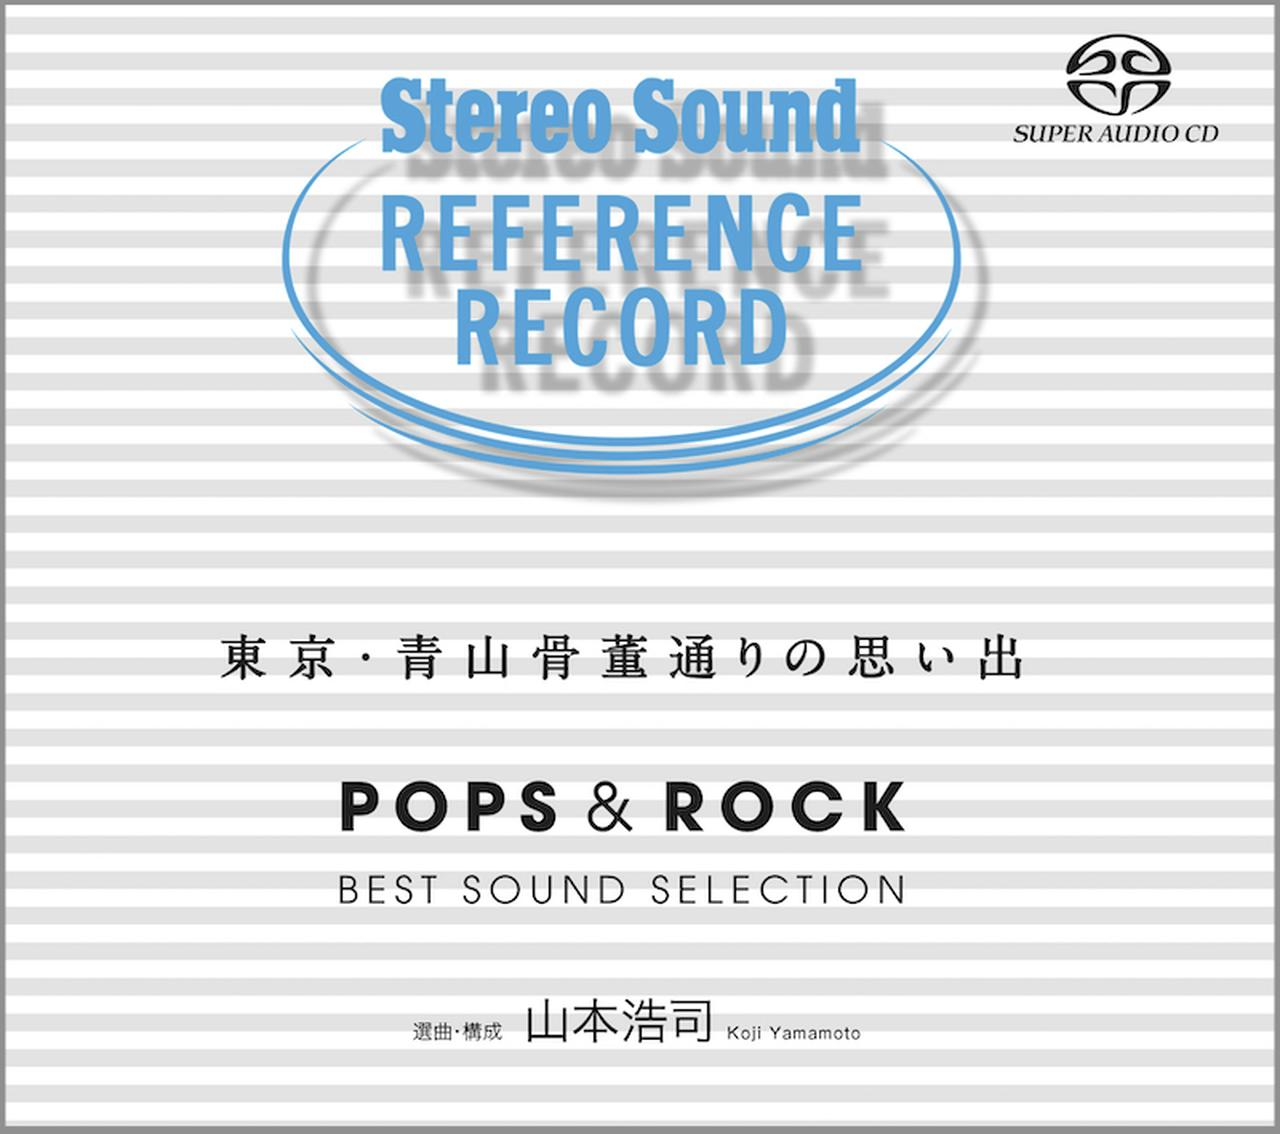 Images : 4番目の画像 - ジャズとクラシックをかけない試聴会 - Stereo Sound ONLINE